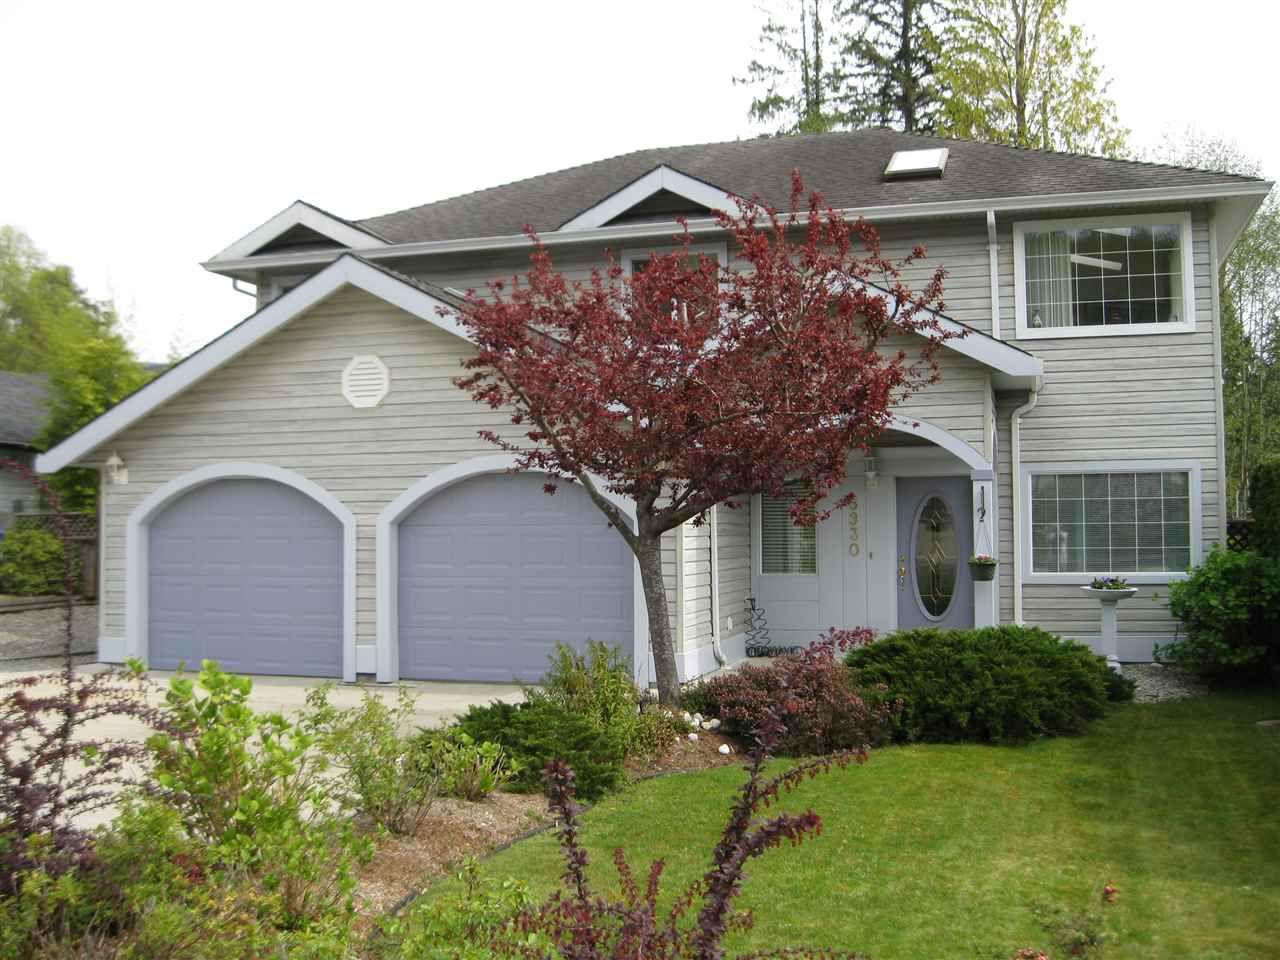 Main Photo: 5930 ST. ANDREWS Place in Sechelt: Sechelt District House for sale (Sunshine Coast)  : MLS®# R2059758